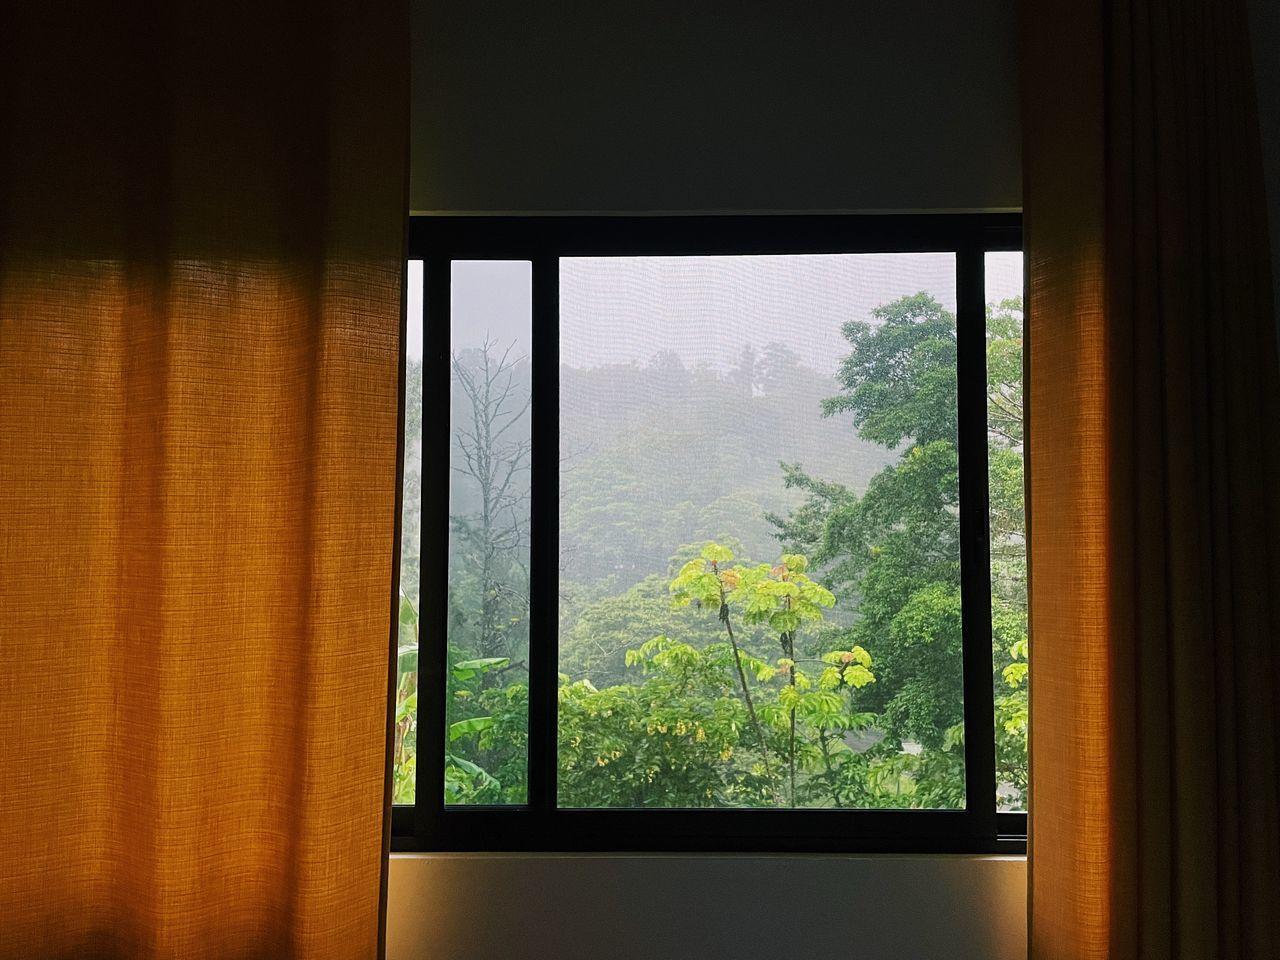 PLANTS SEEN THROUGH WINDOW OF HOUSE